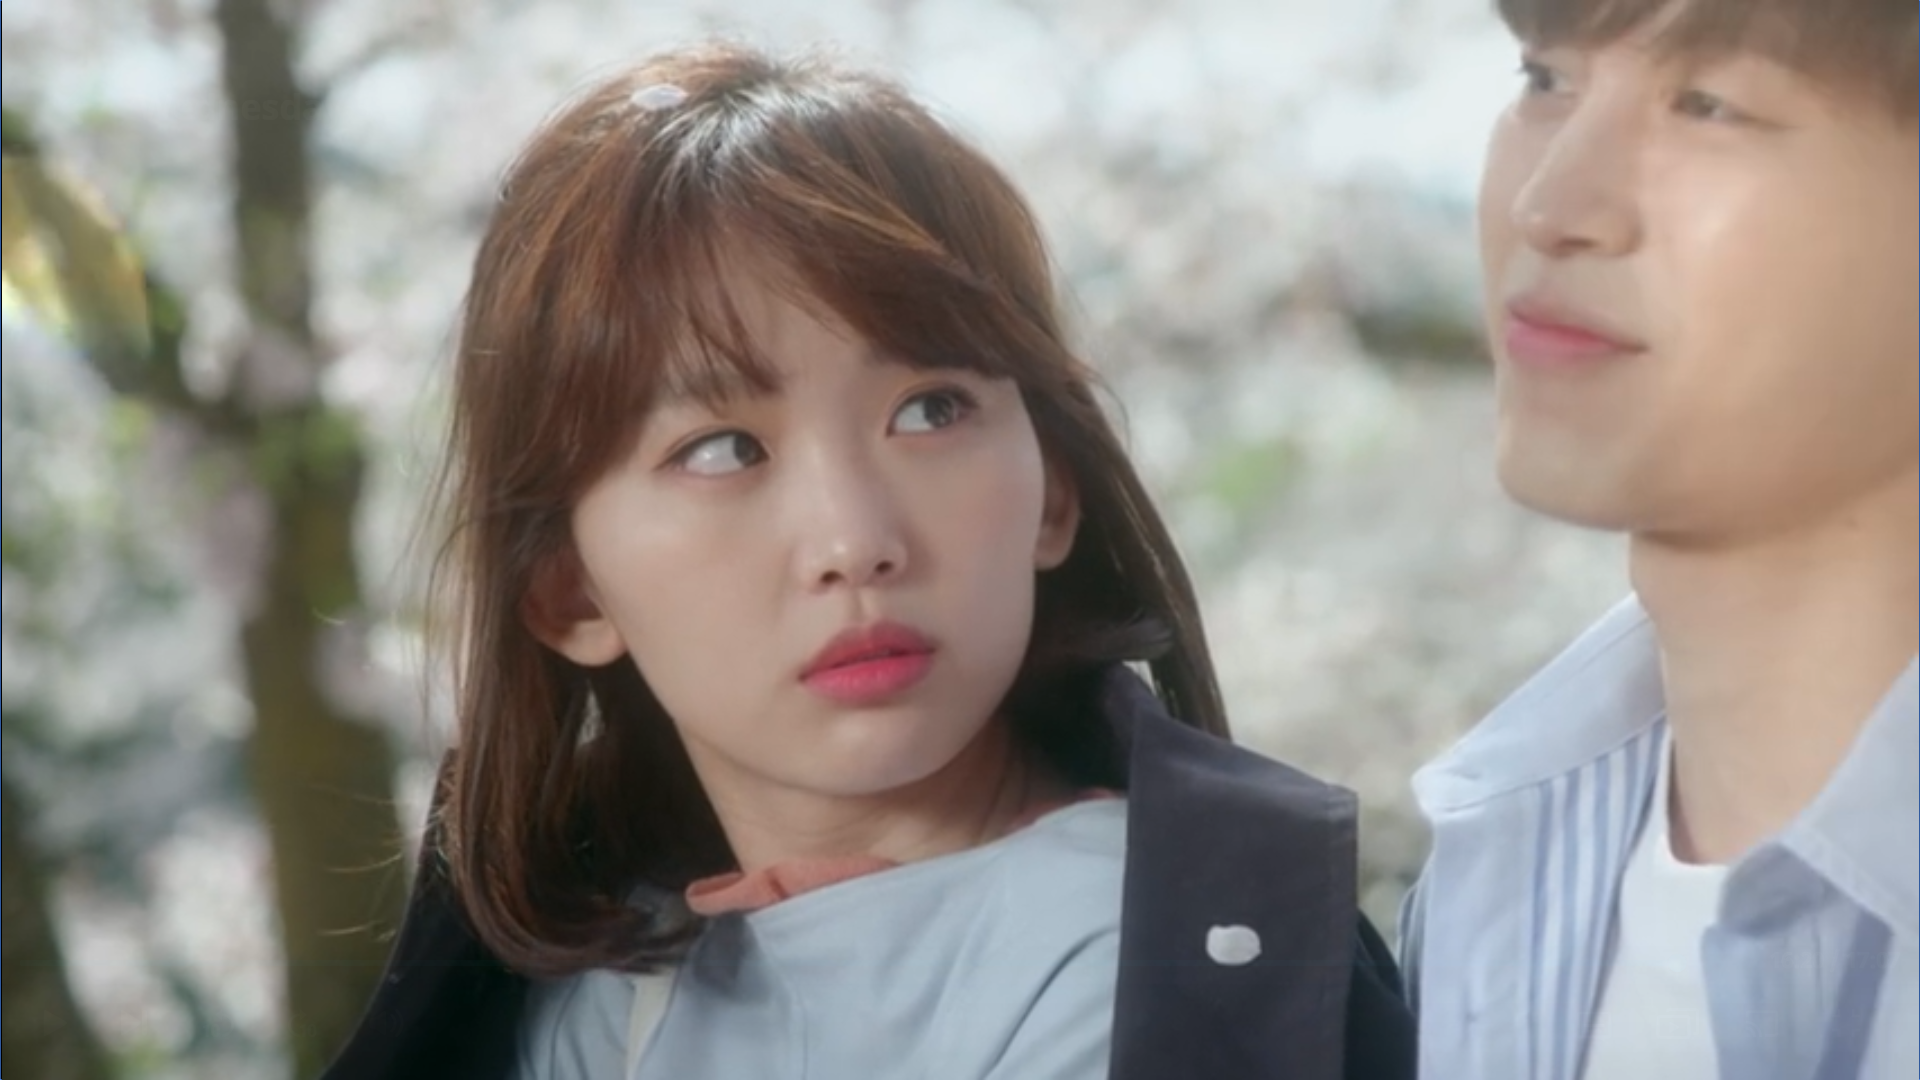 Wednesday 3:30 PM Seon Eun-woo and Yoon Jae-won at cherry blossom